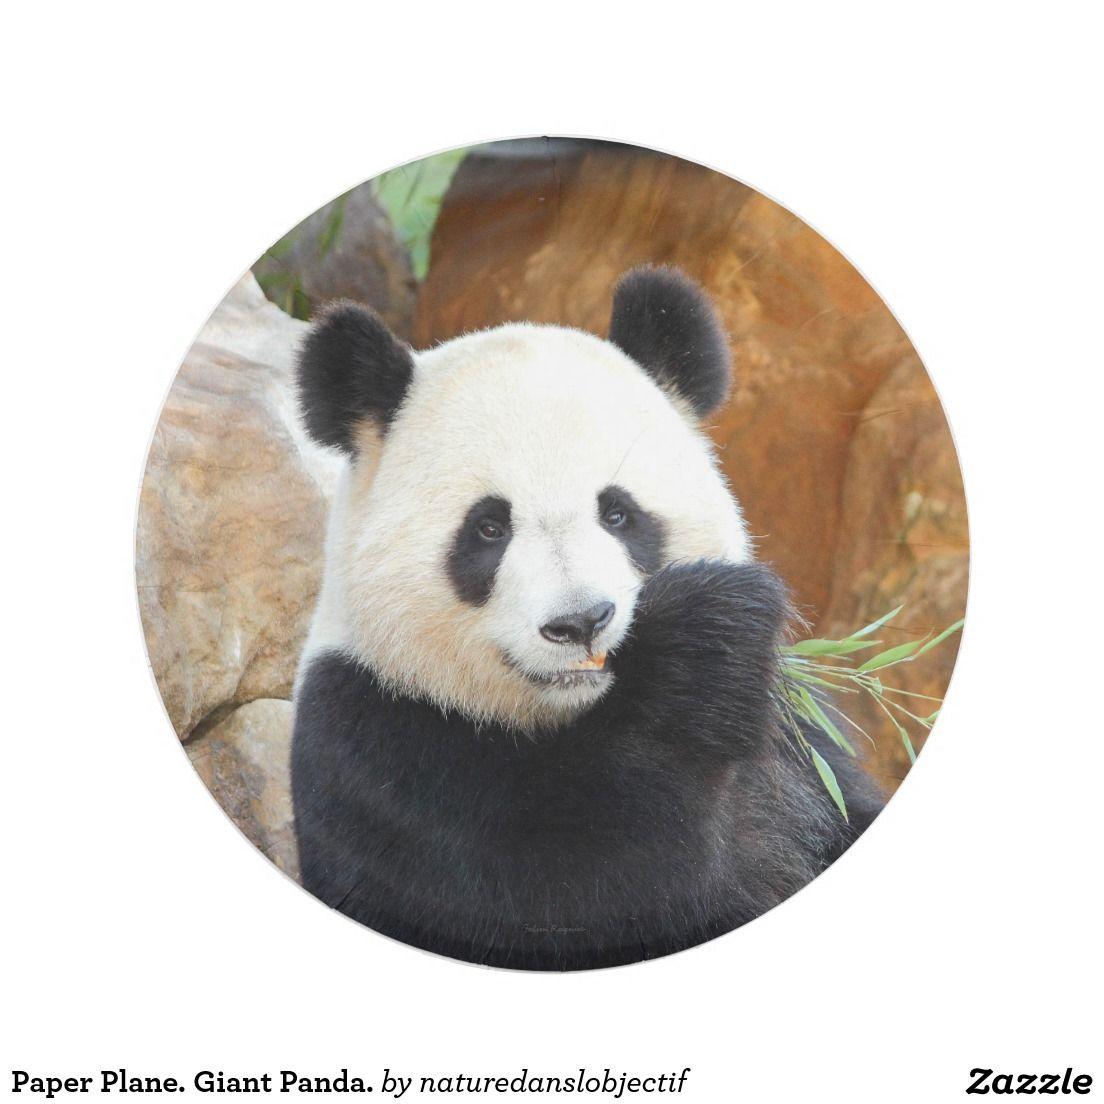 Plane Paper. Giant Panda Paper Plate  sc 1 st  Pinterest & Plane Paper. Giant Panda Paper Plate | Zazzle PodArtist Community ...